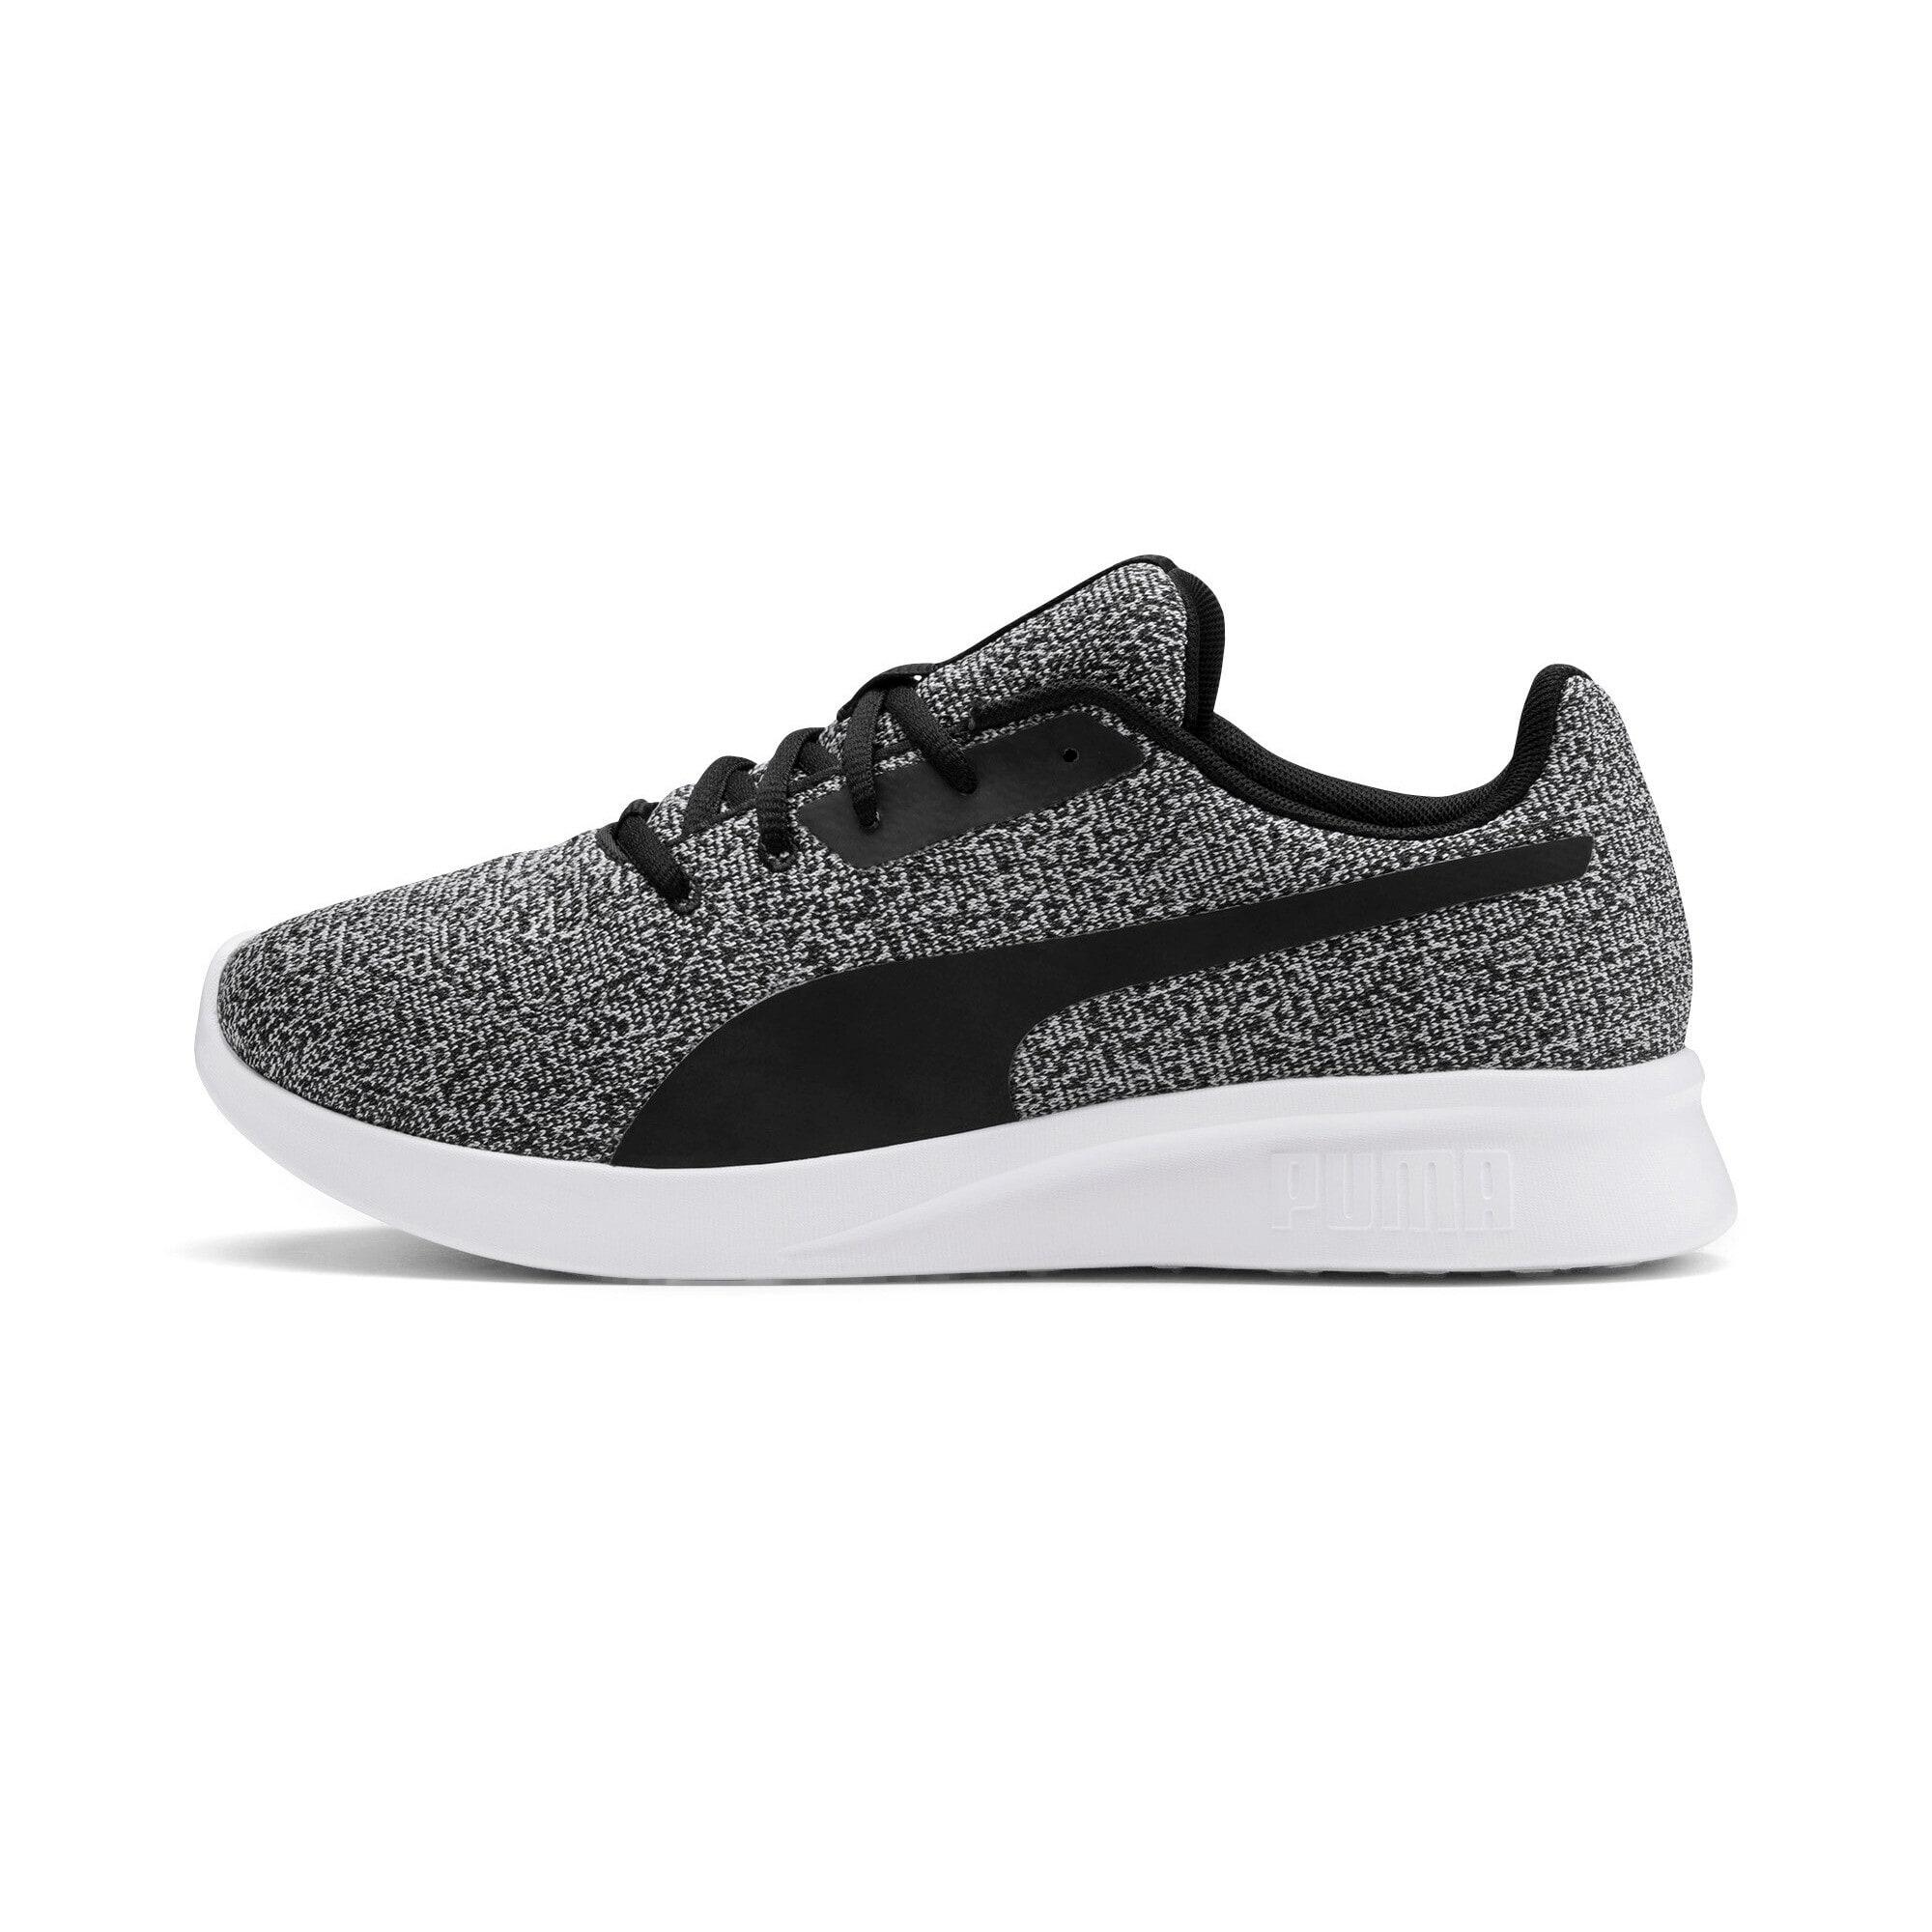 Thumbnail 1 of Modern Runner Sneakers, Gray Violet-Puma Black, medium-IND